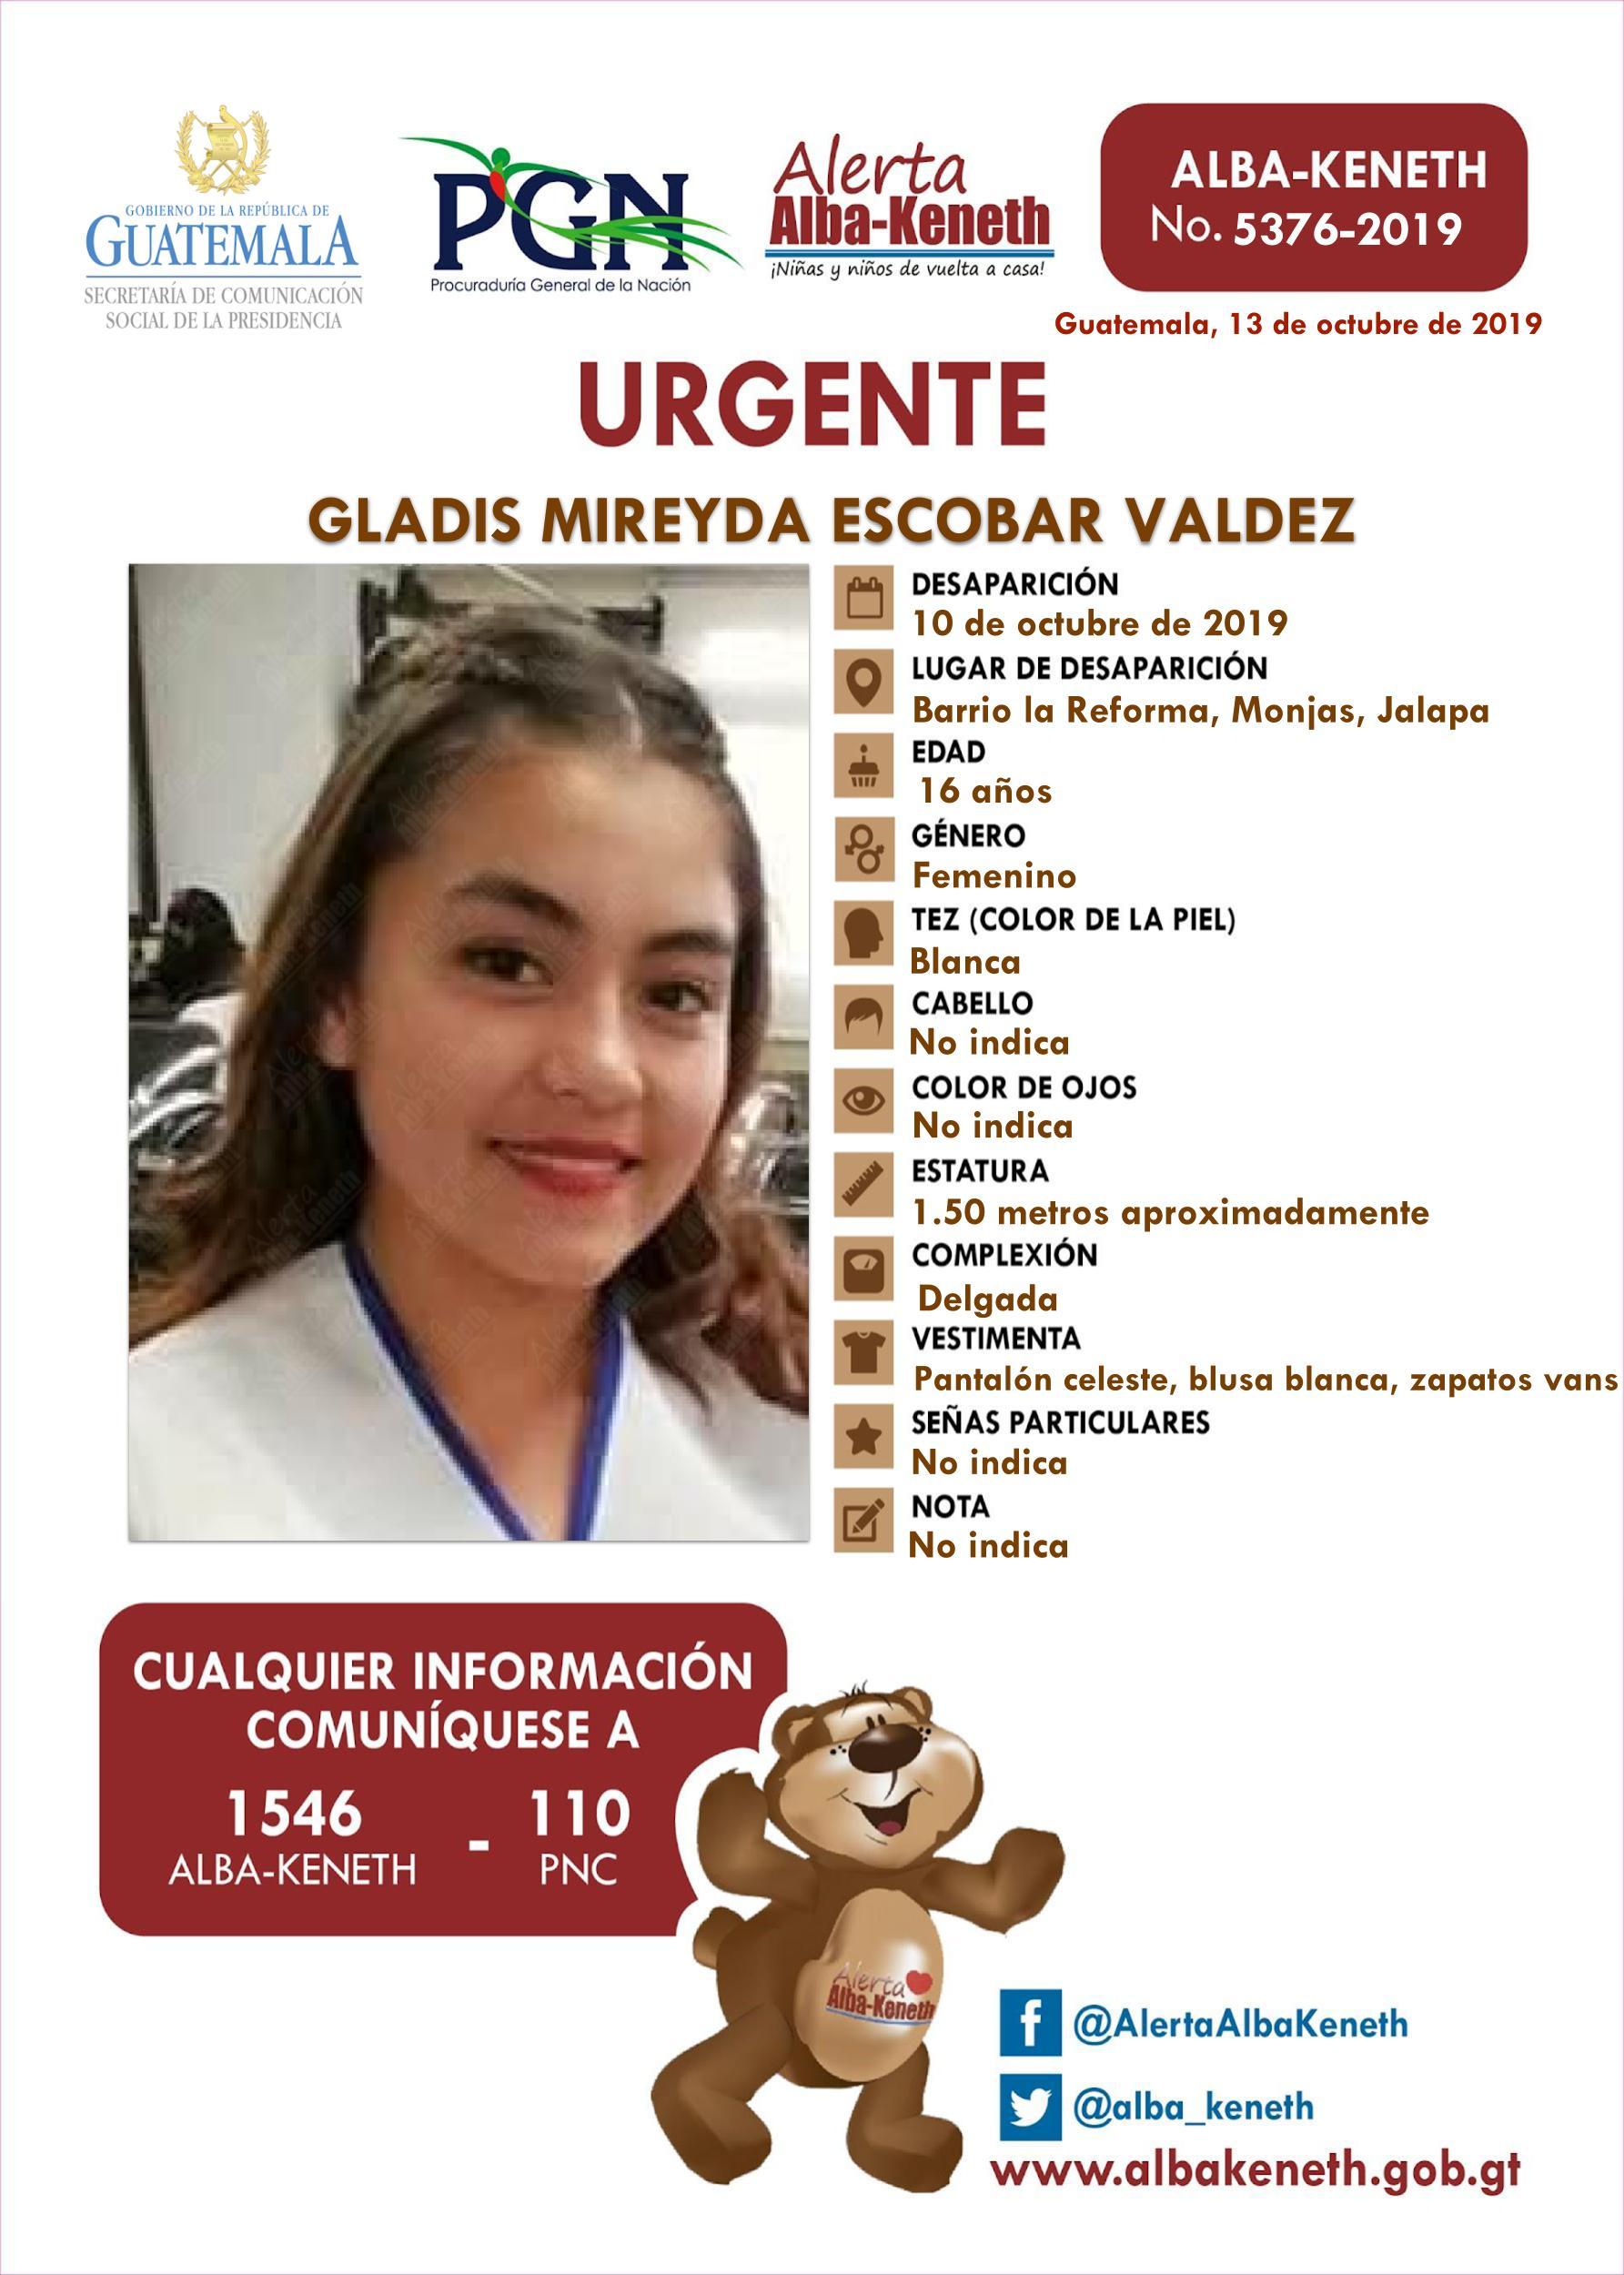 Gladis Mireyda Escobar Valdez